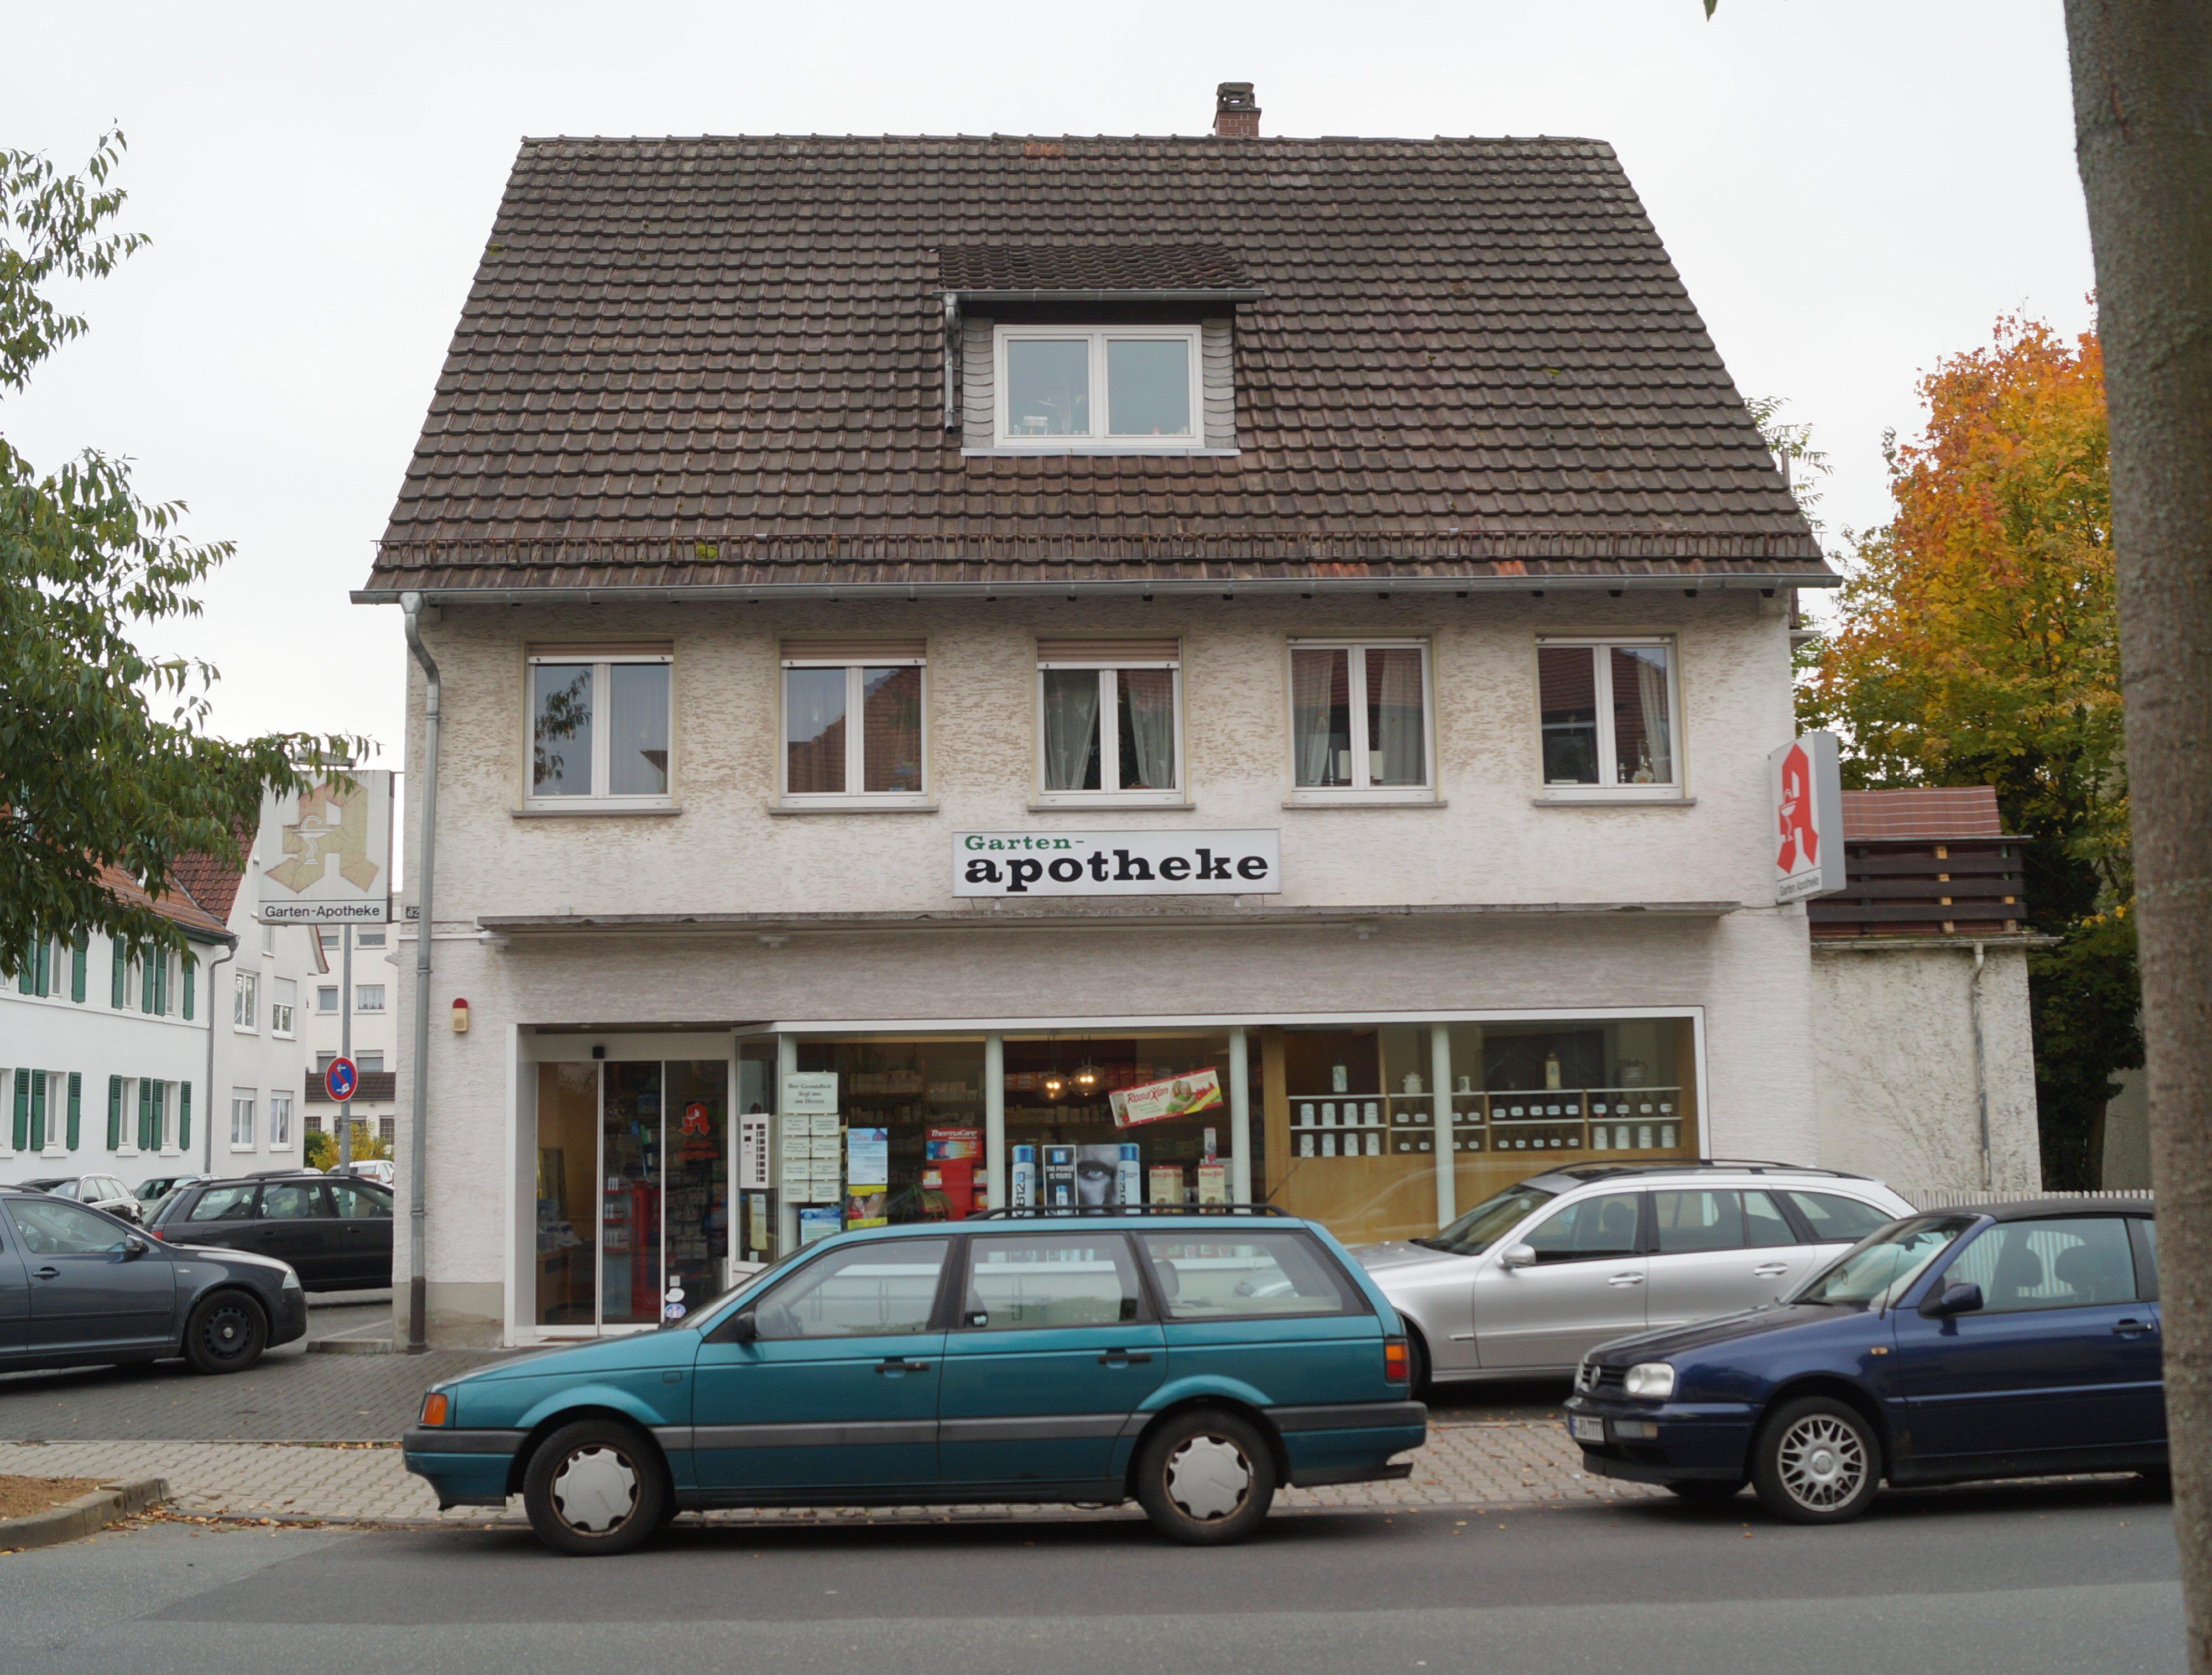 Garten Apotheke Langen